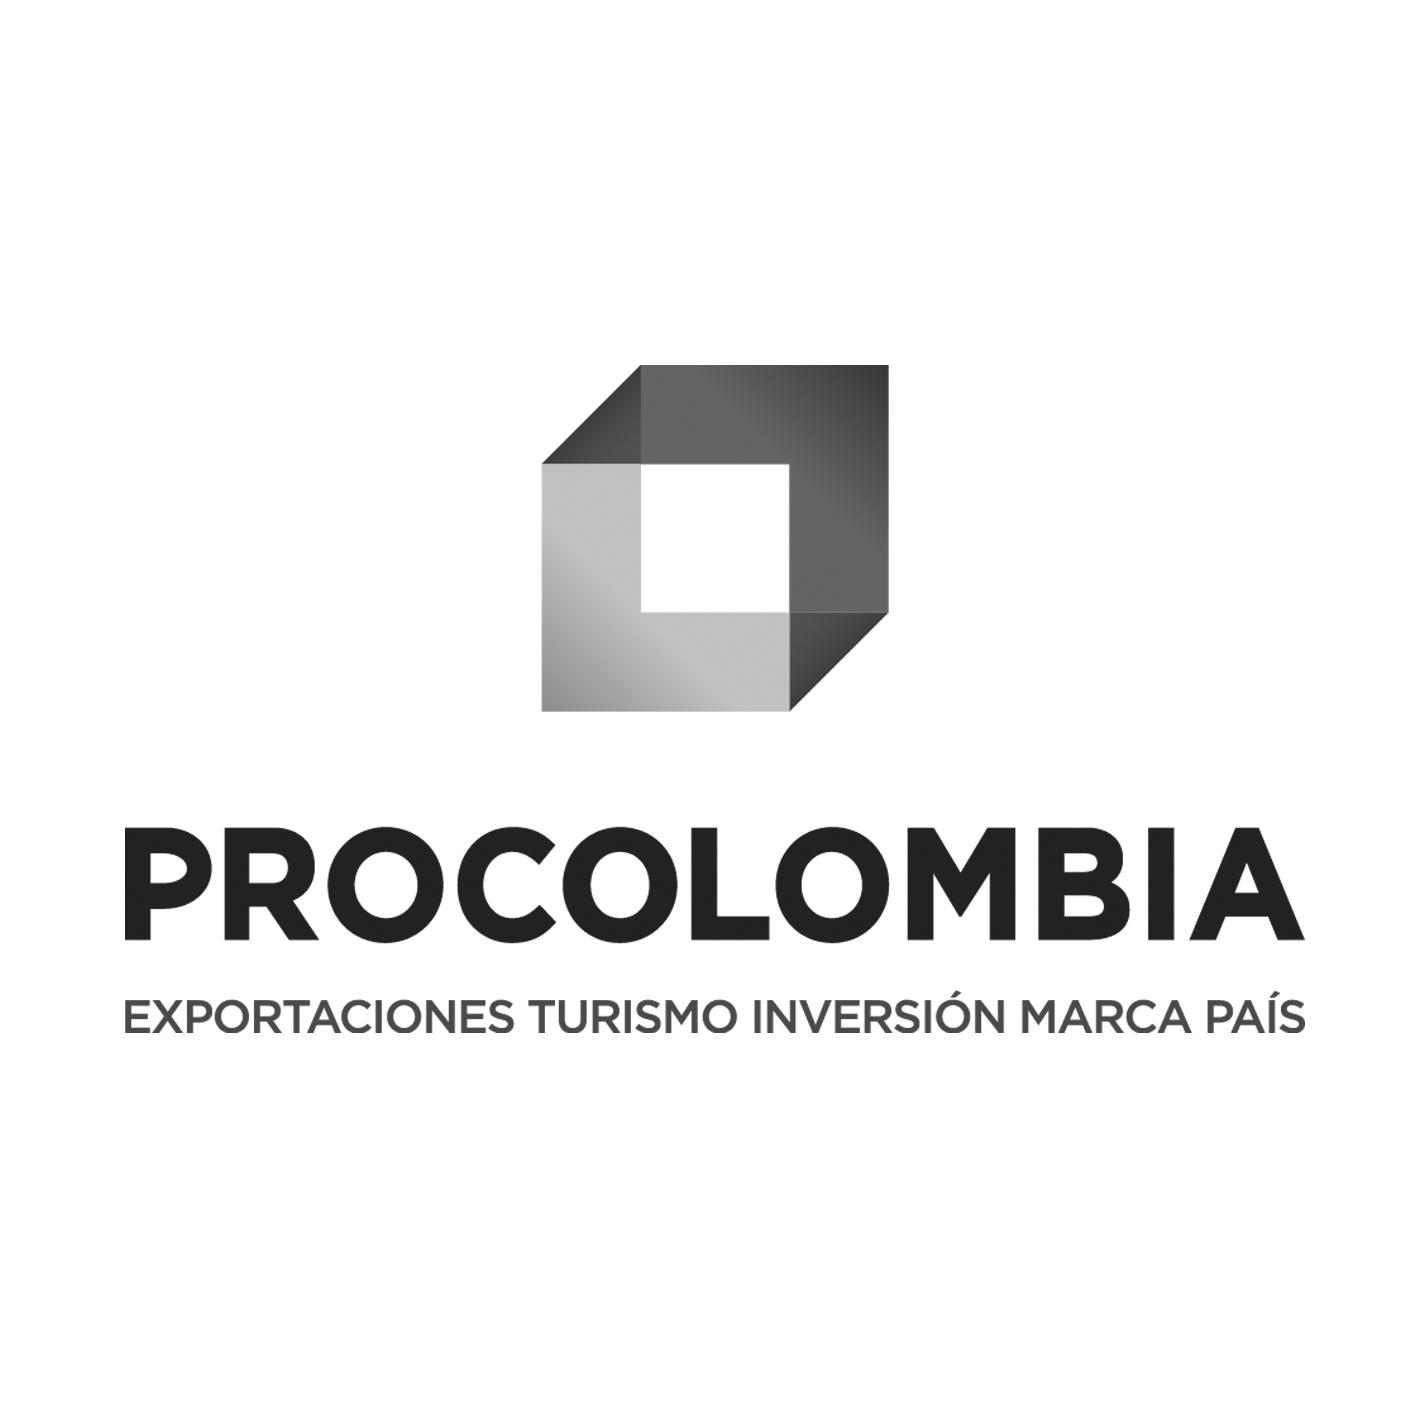 procolombia-logo_mono.jpg